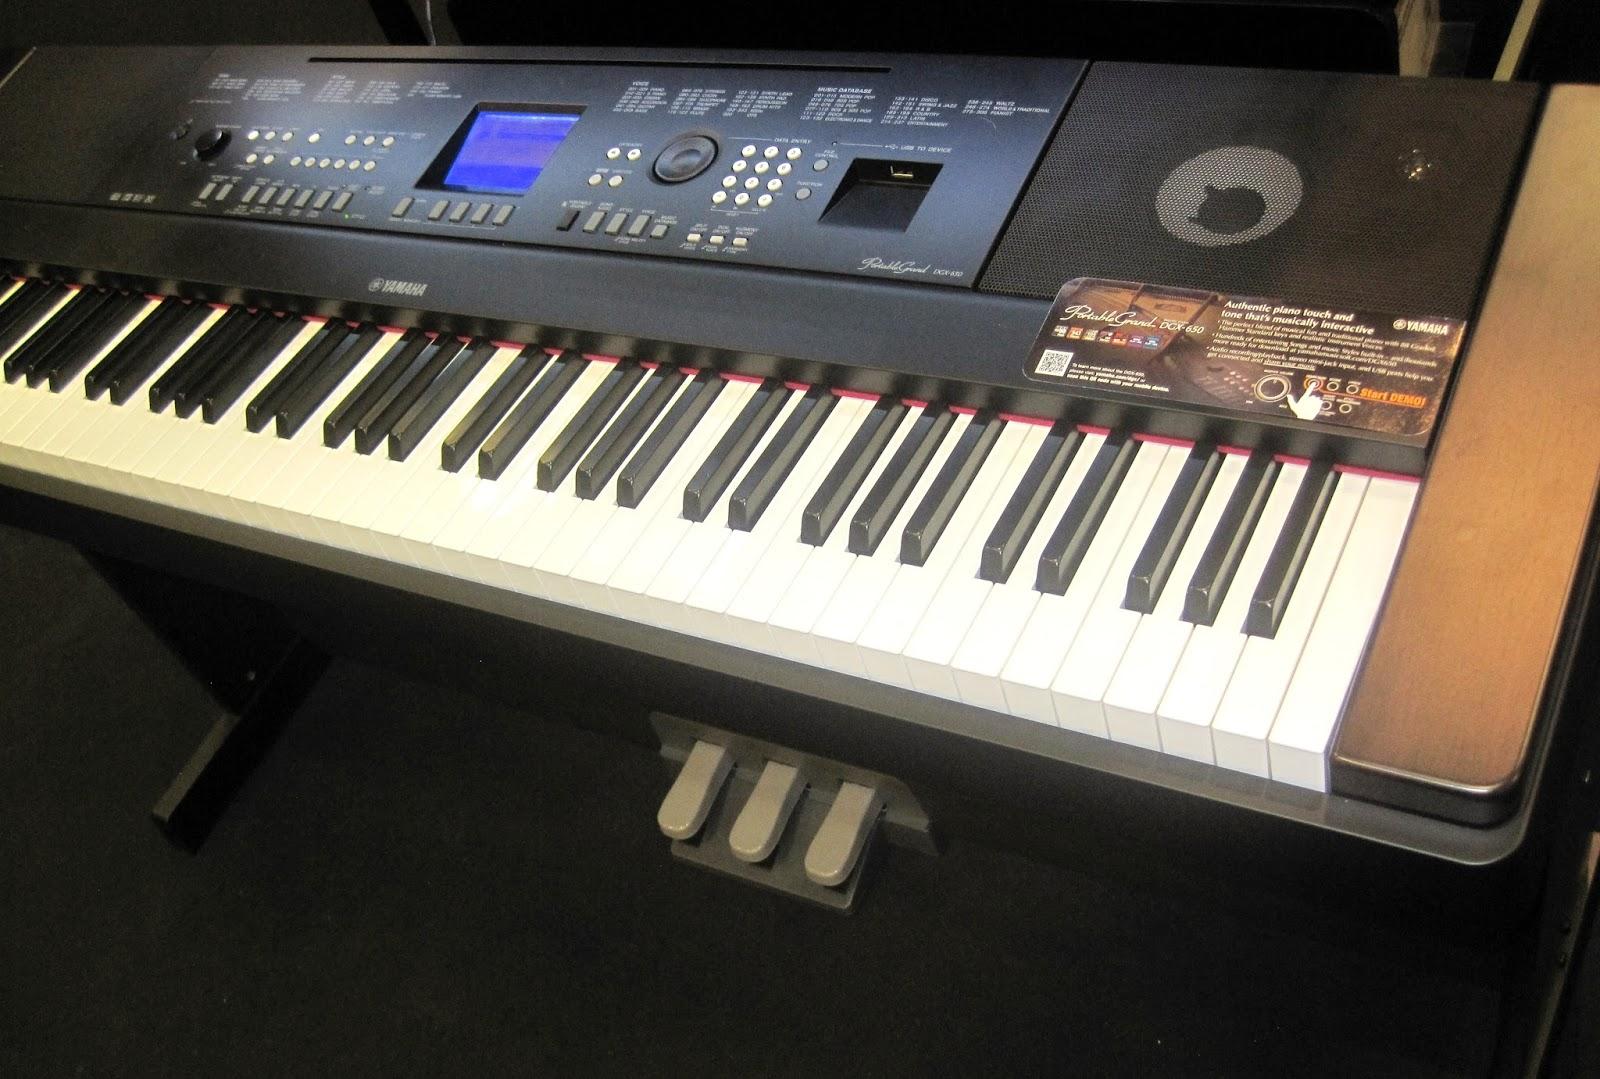 yamaha-C6X-grand-piano-frontview Yamaha Piano Models